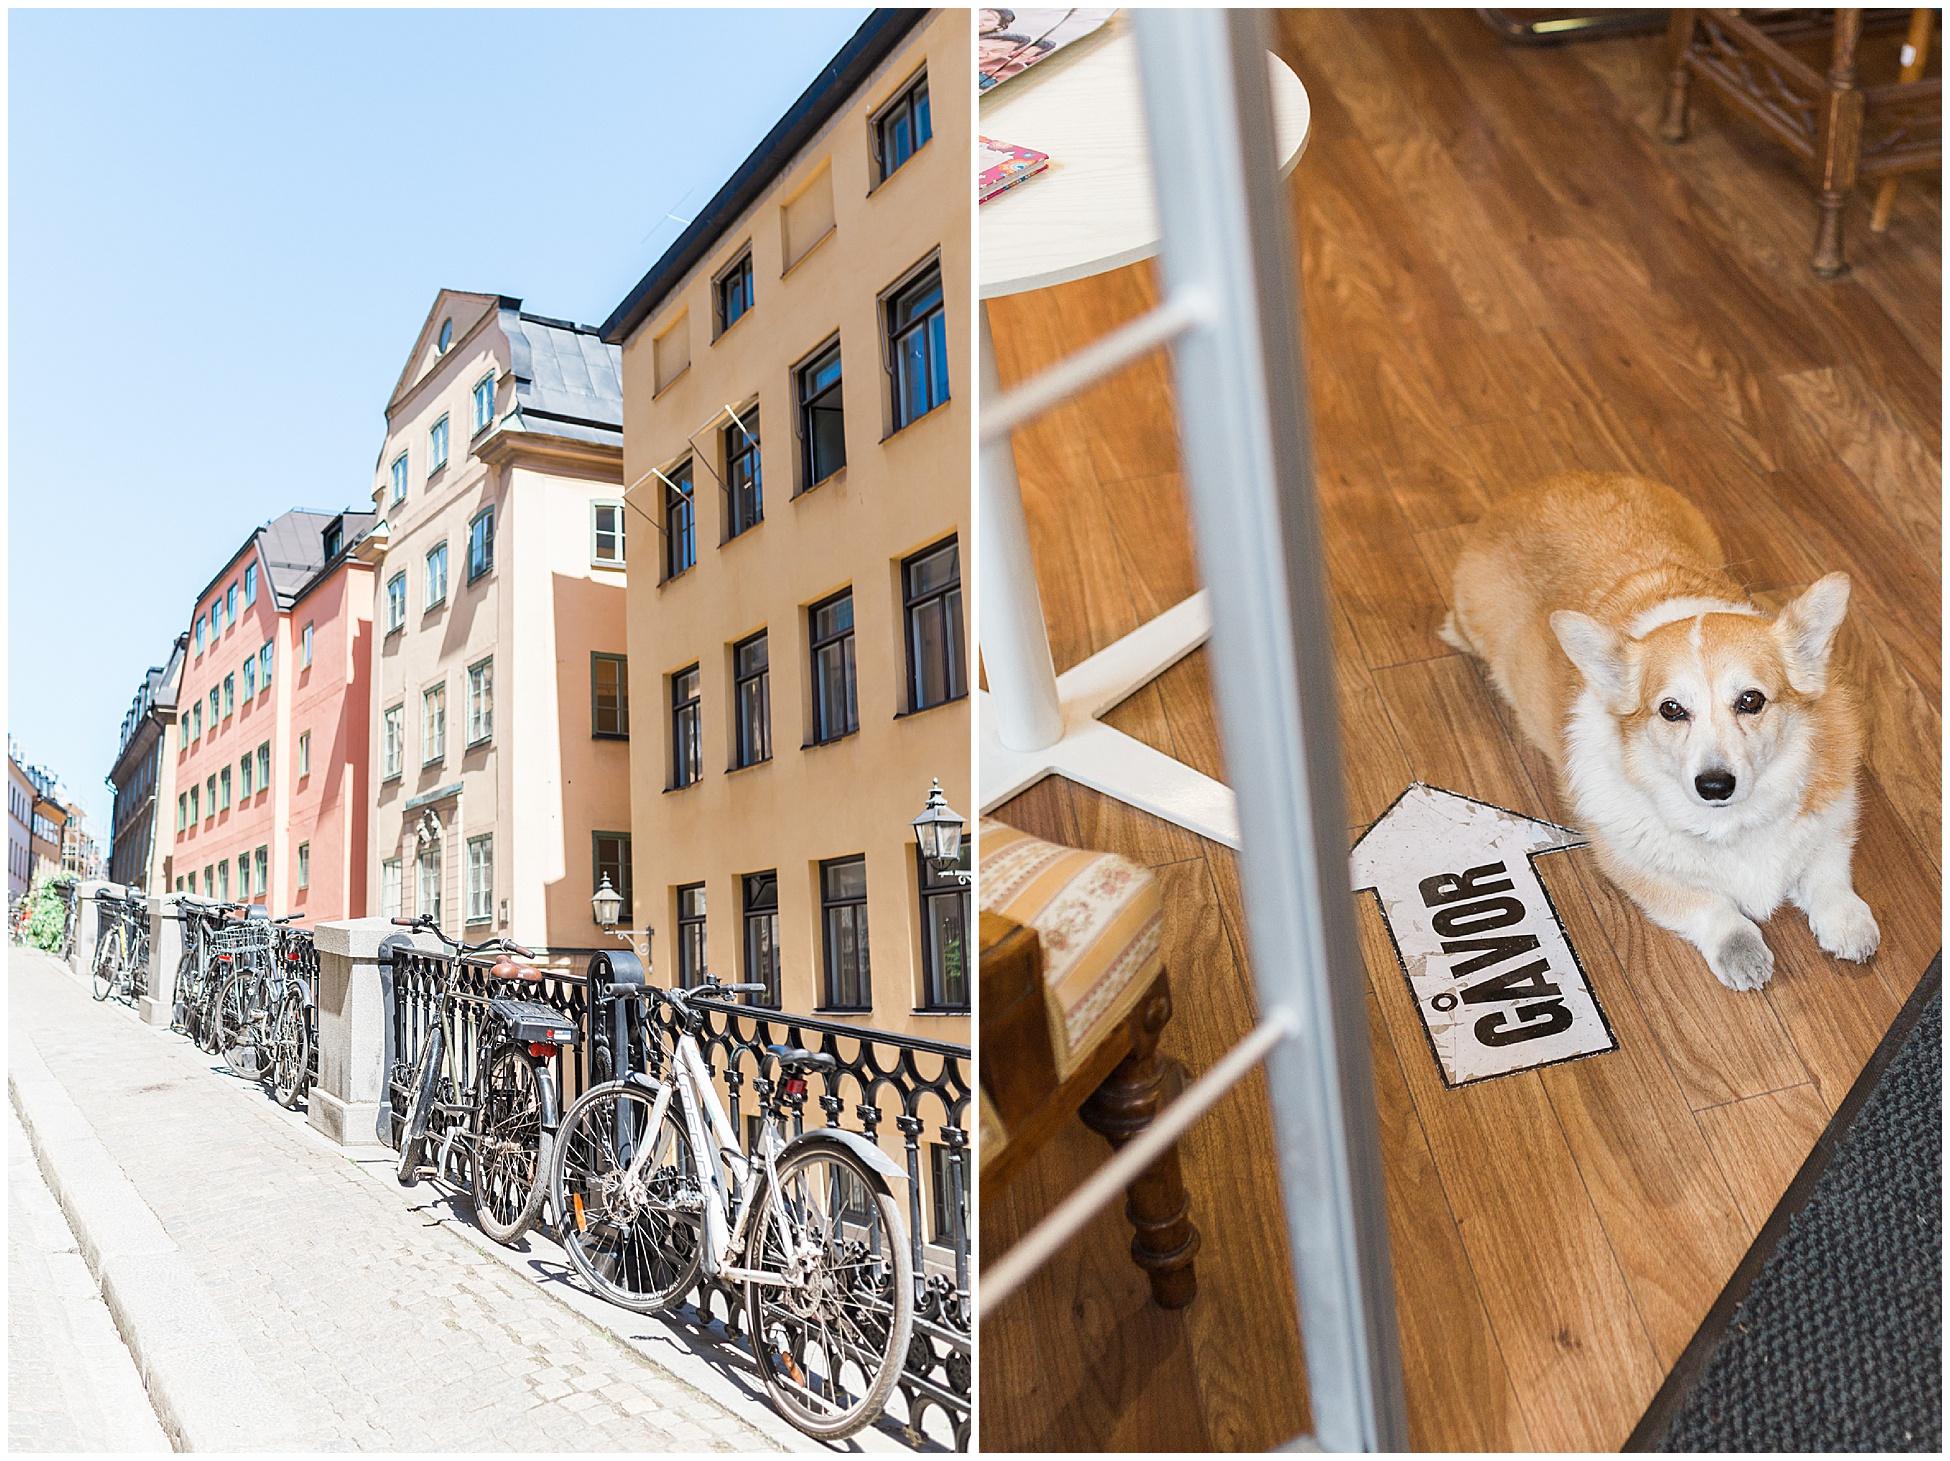 stockholm-012.jpg